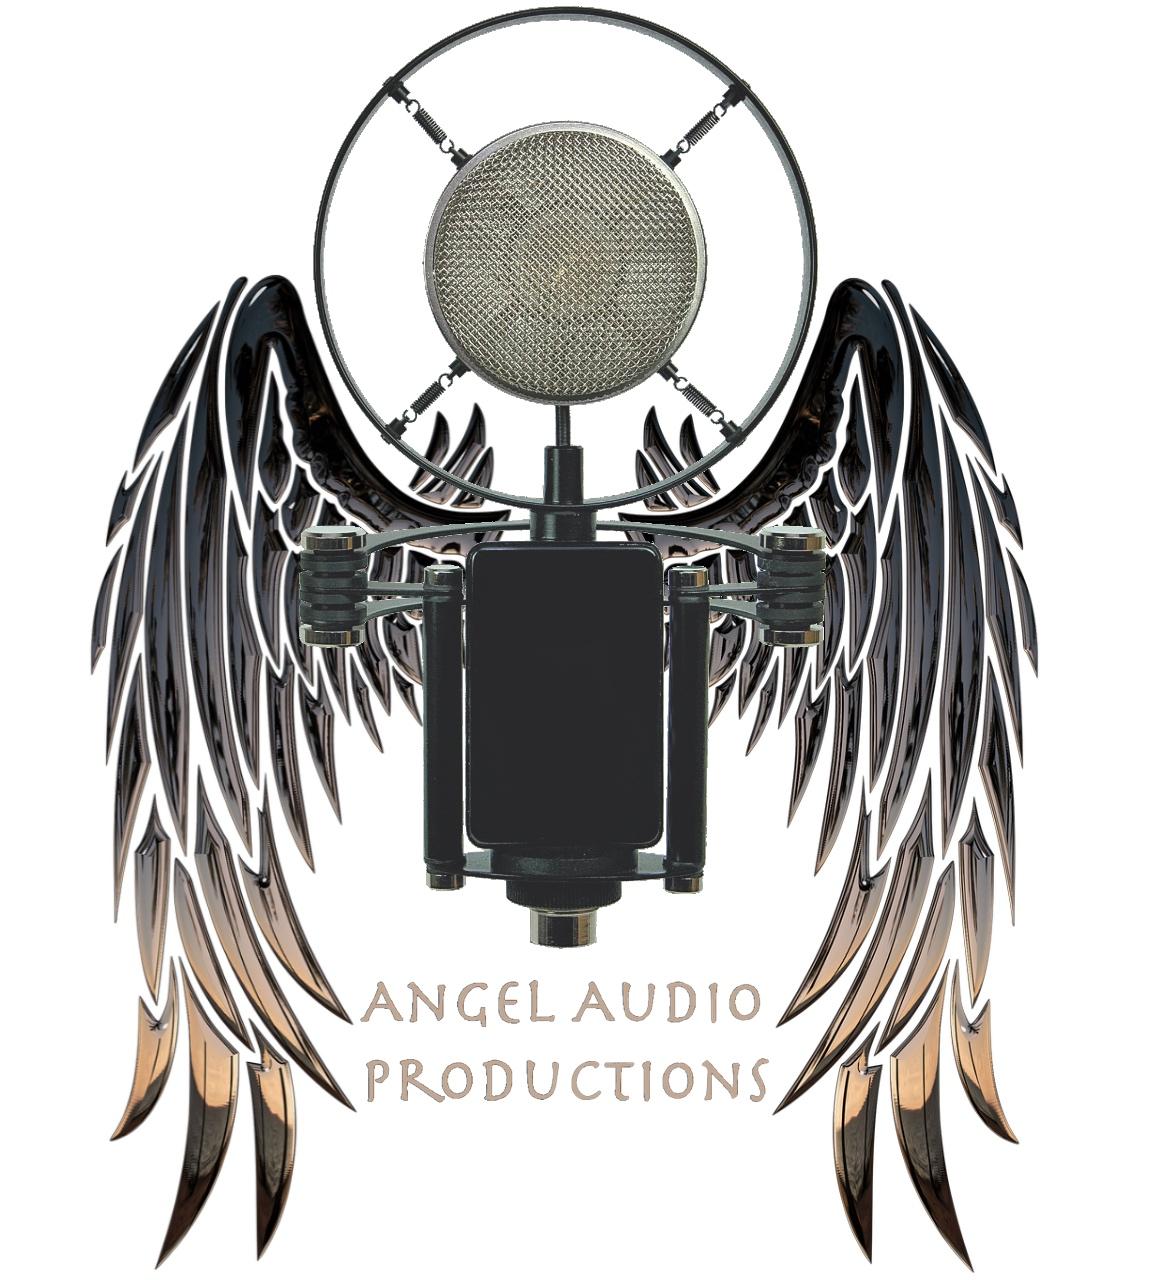 Angel Audio Productions